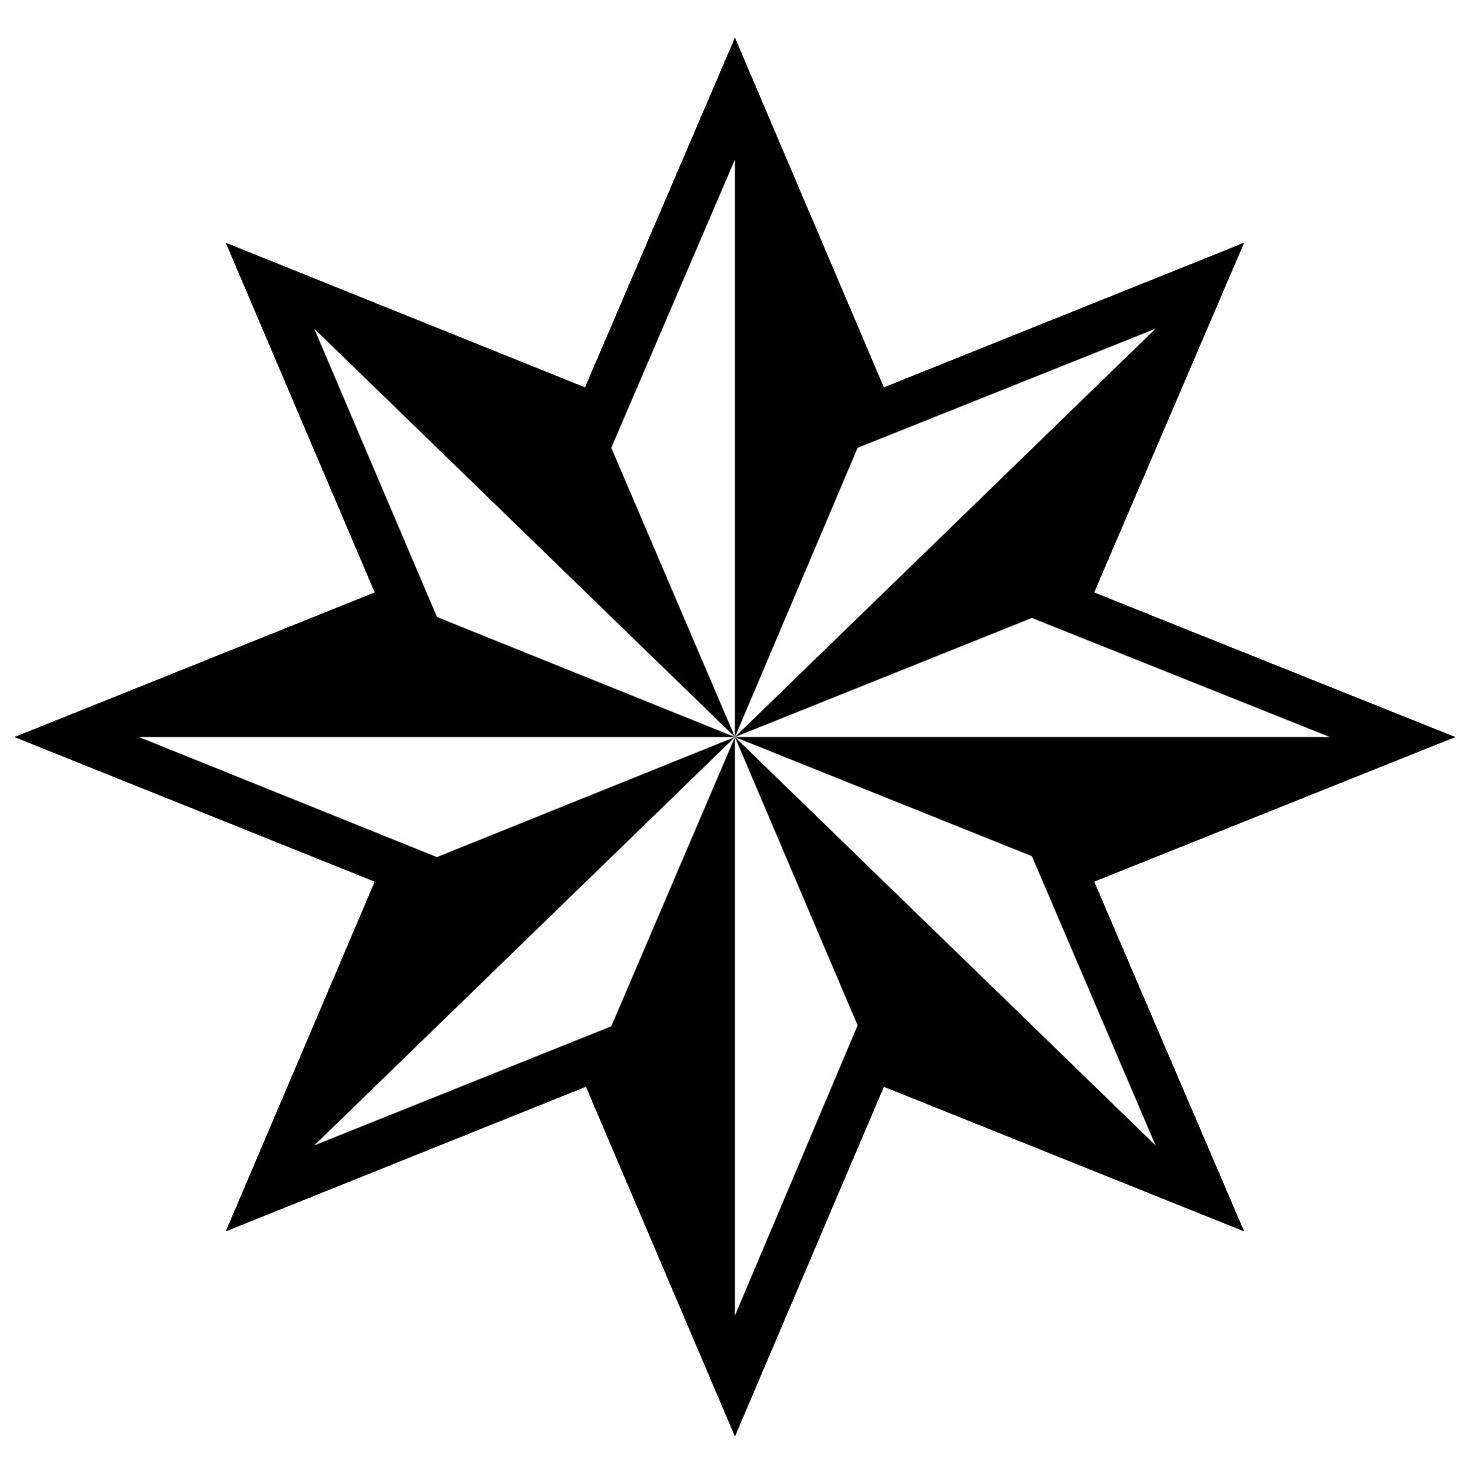 Star clipart jpeg jpg stock From eight point star clipart - Clipground jpg stock